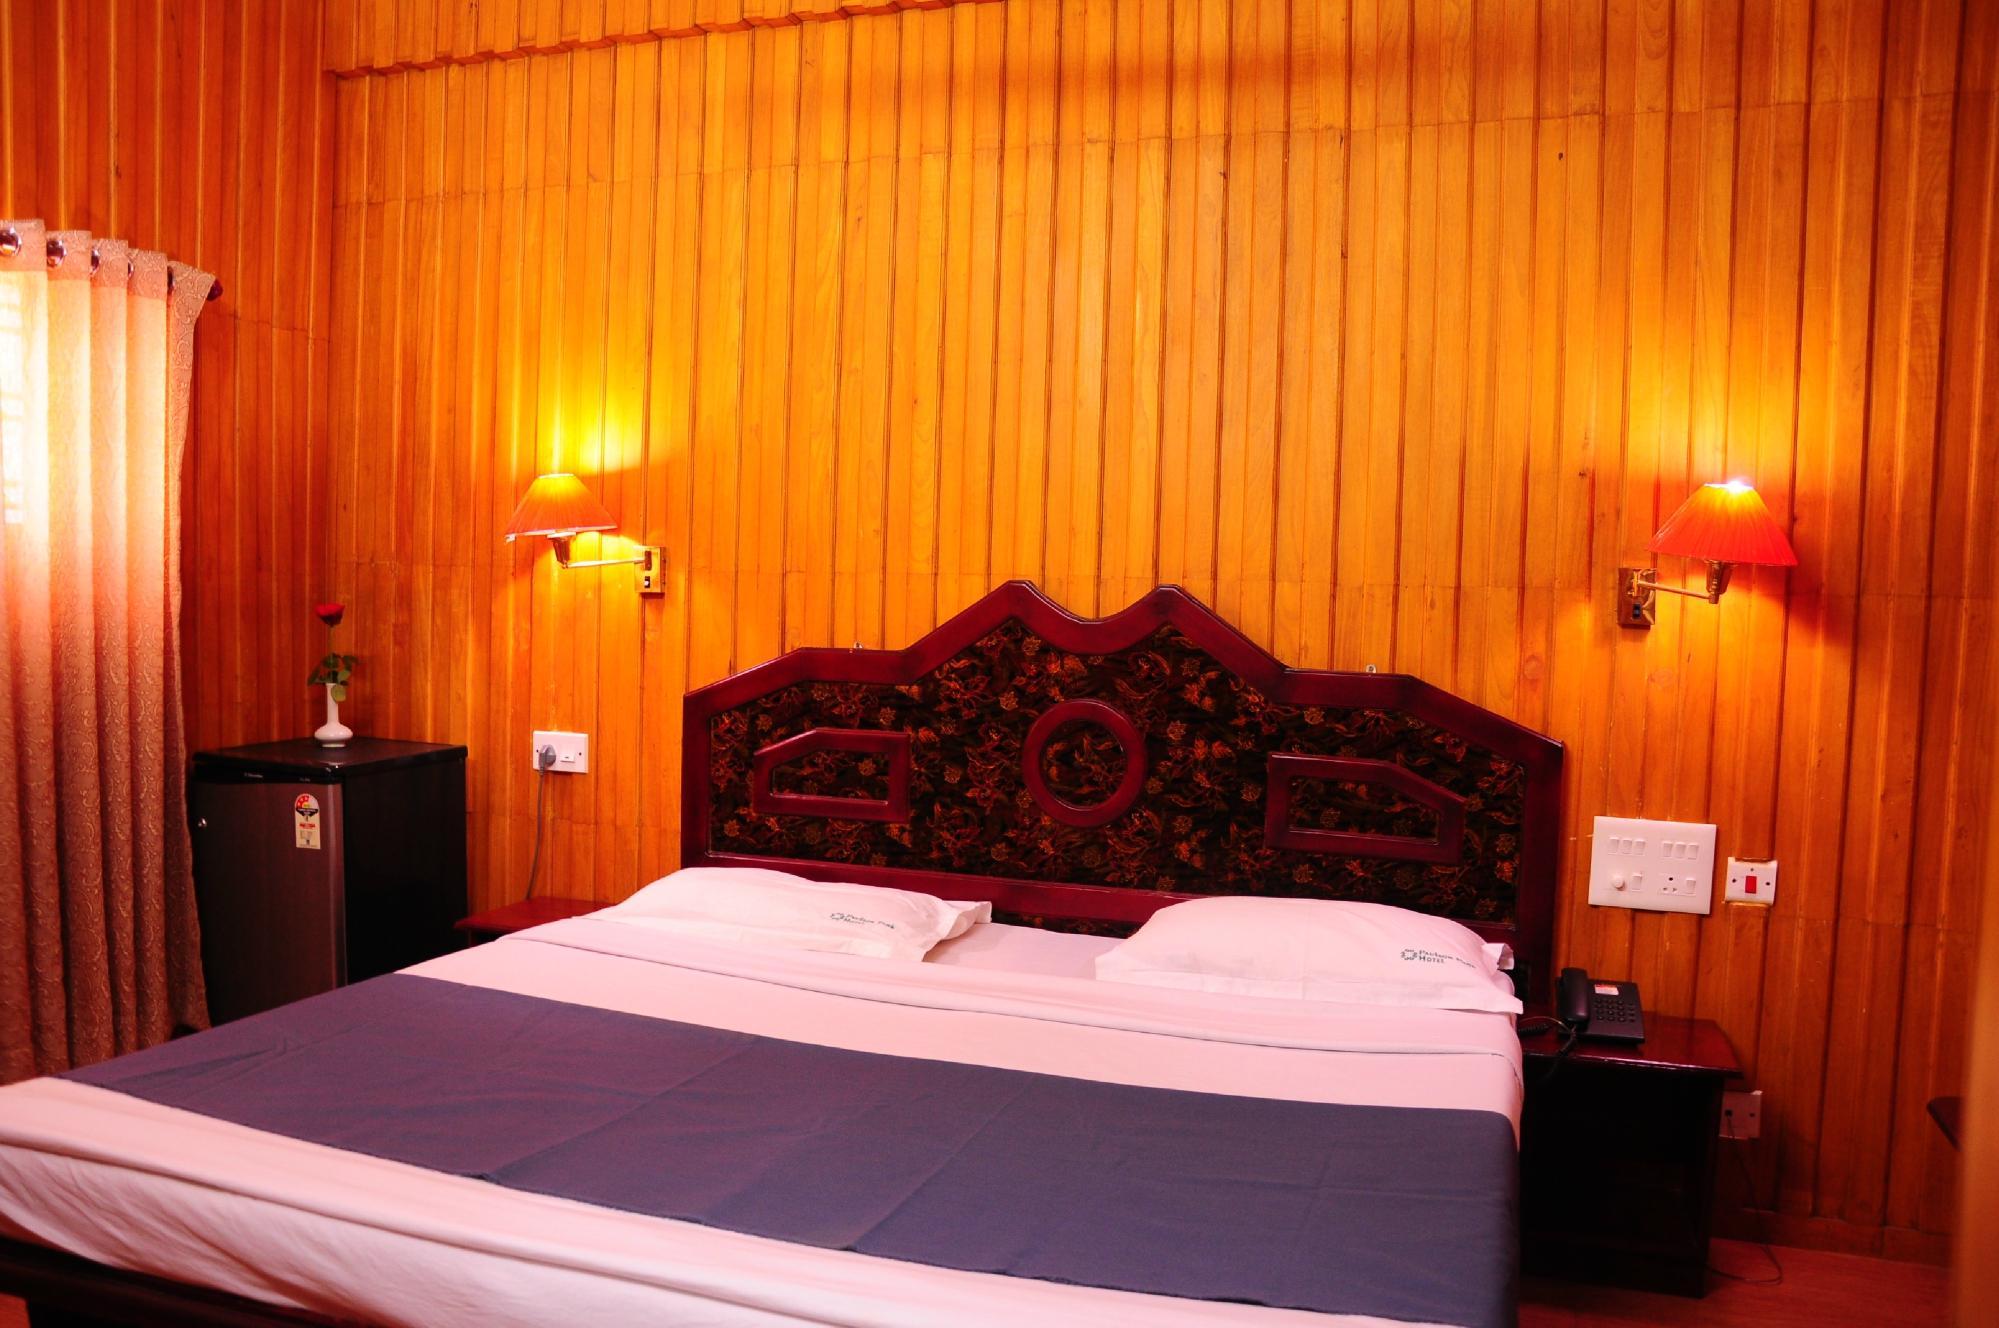 Paulson Park Hotel